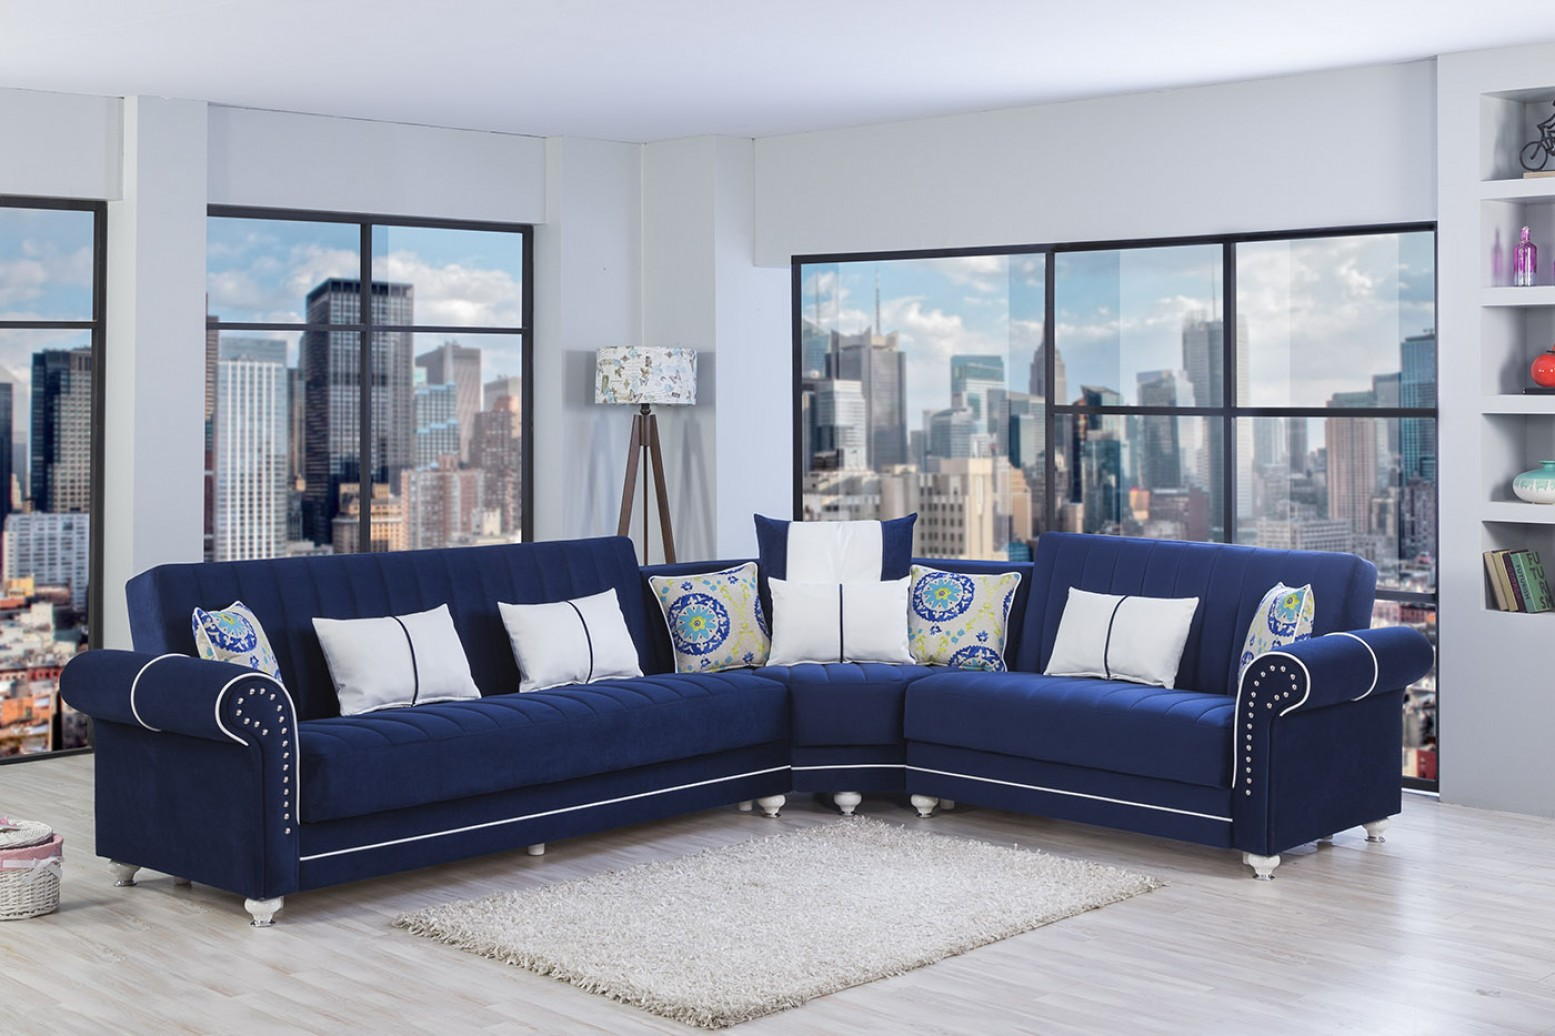 royal home sectional sofa riva dark blue